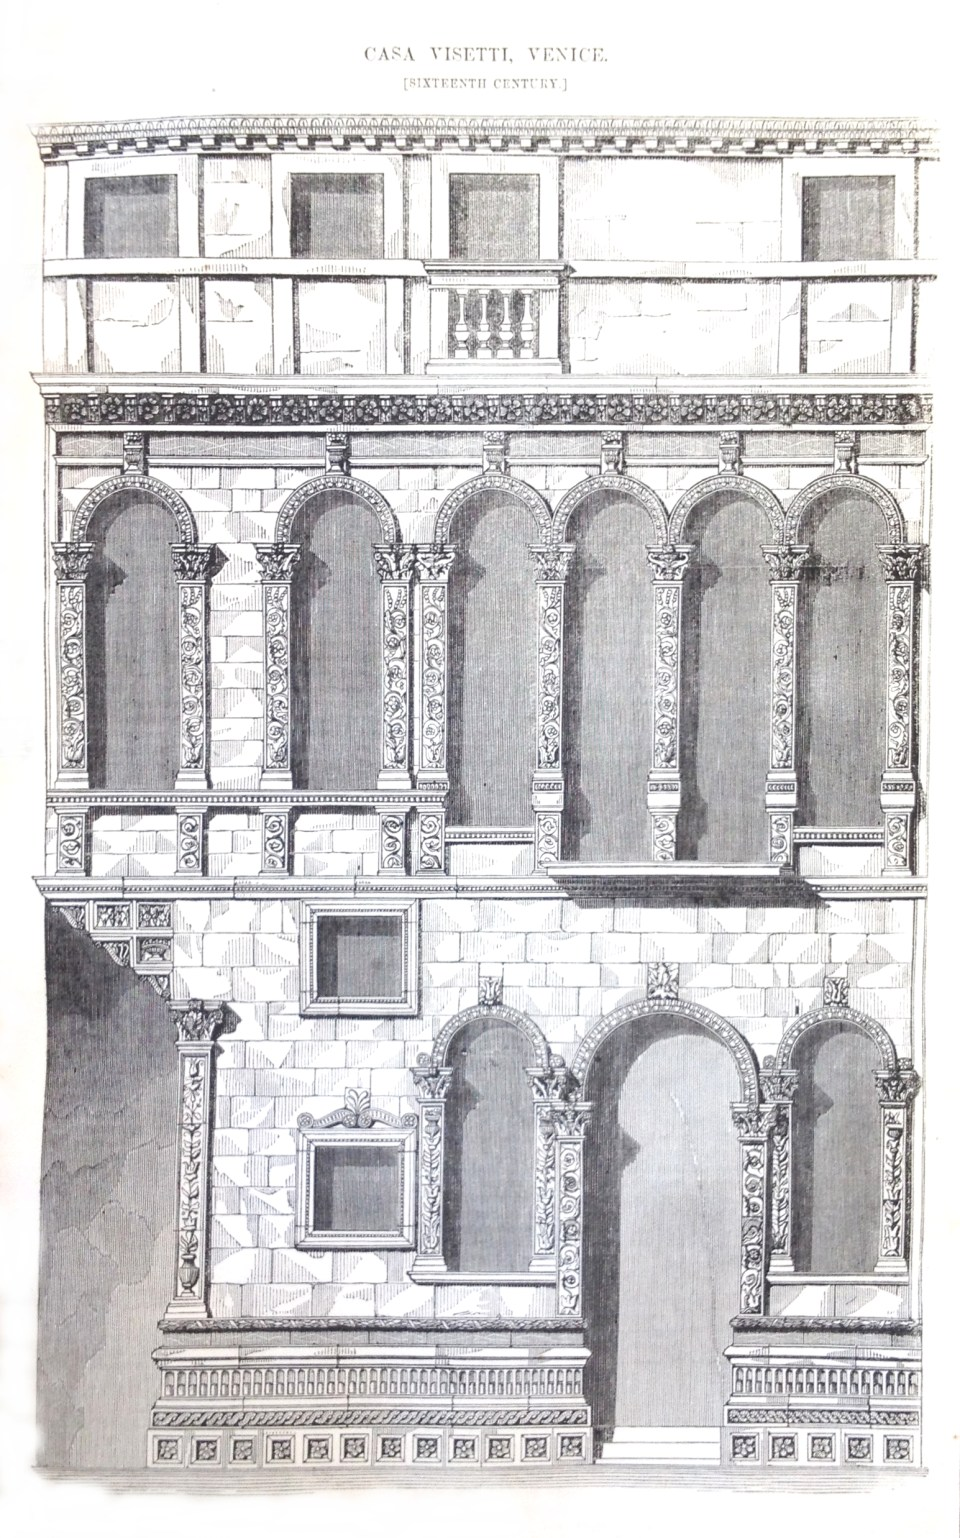 Casa Visetti